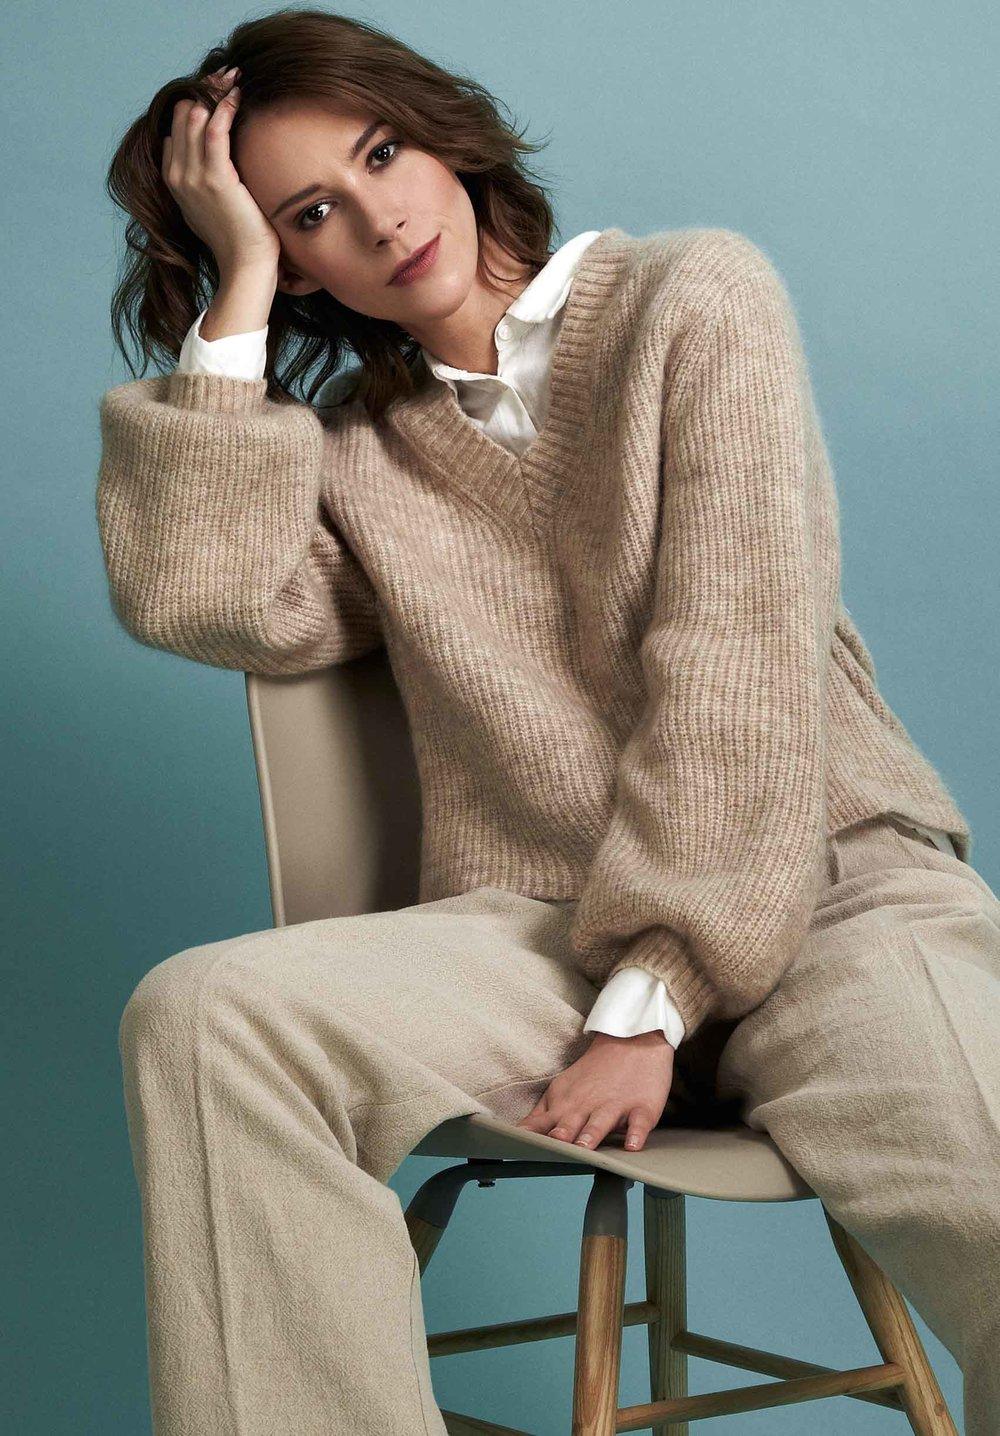 Professional Model Martina im beige Look